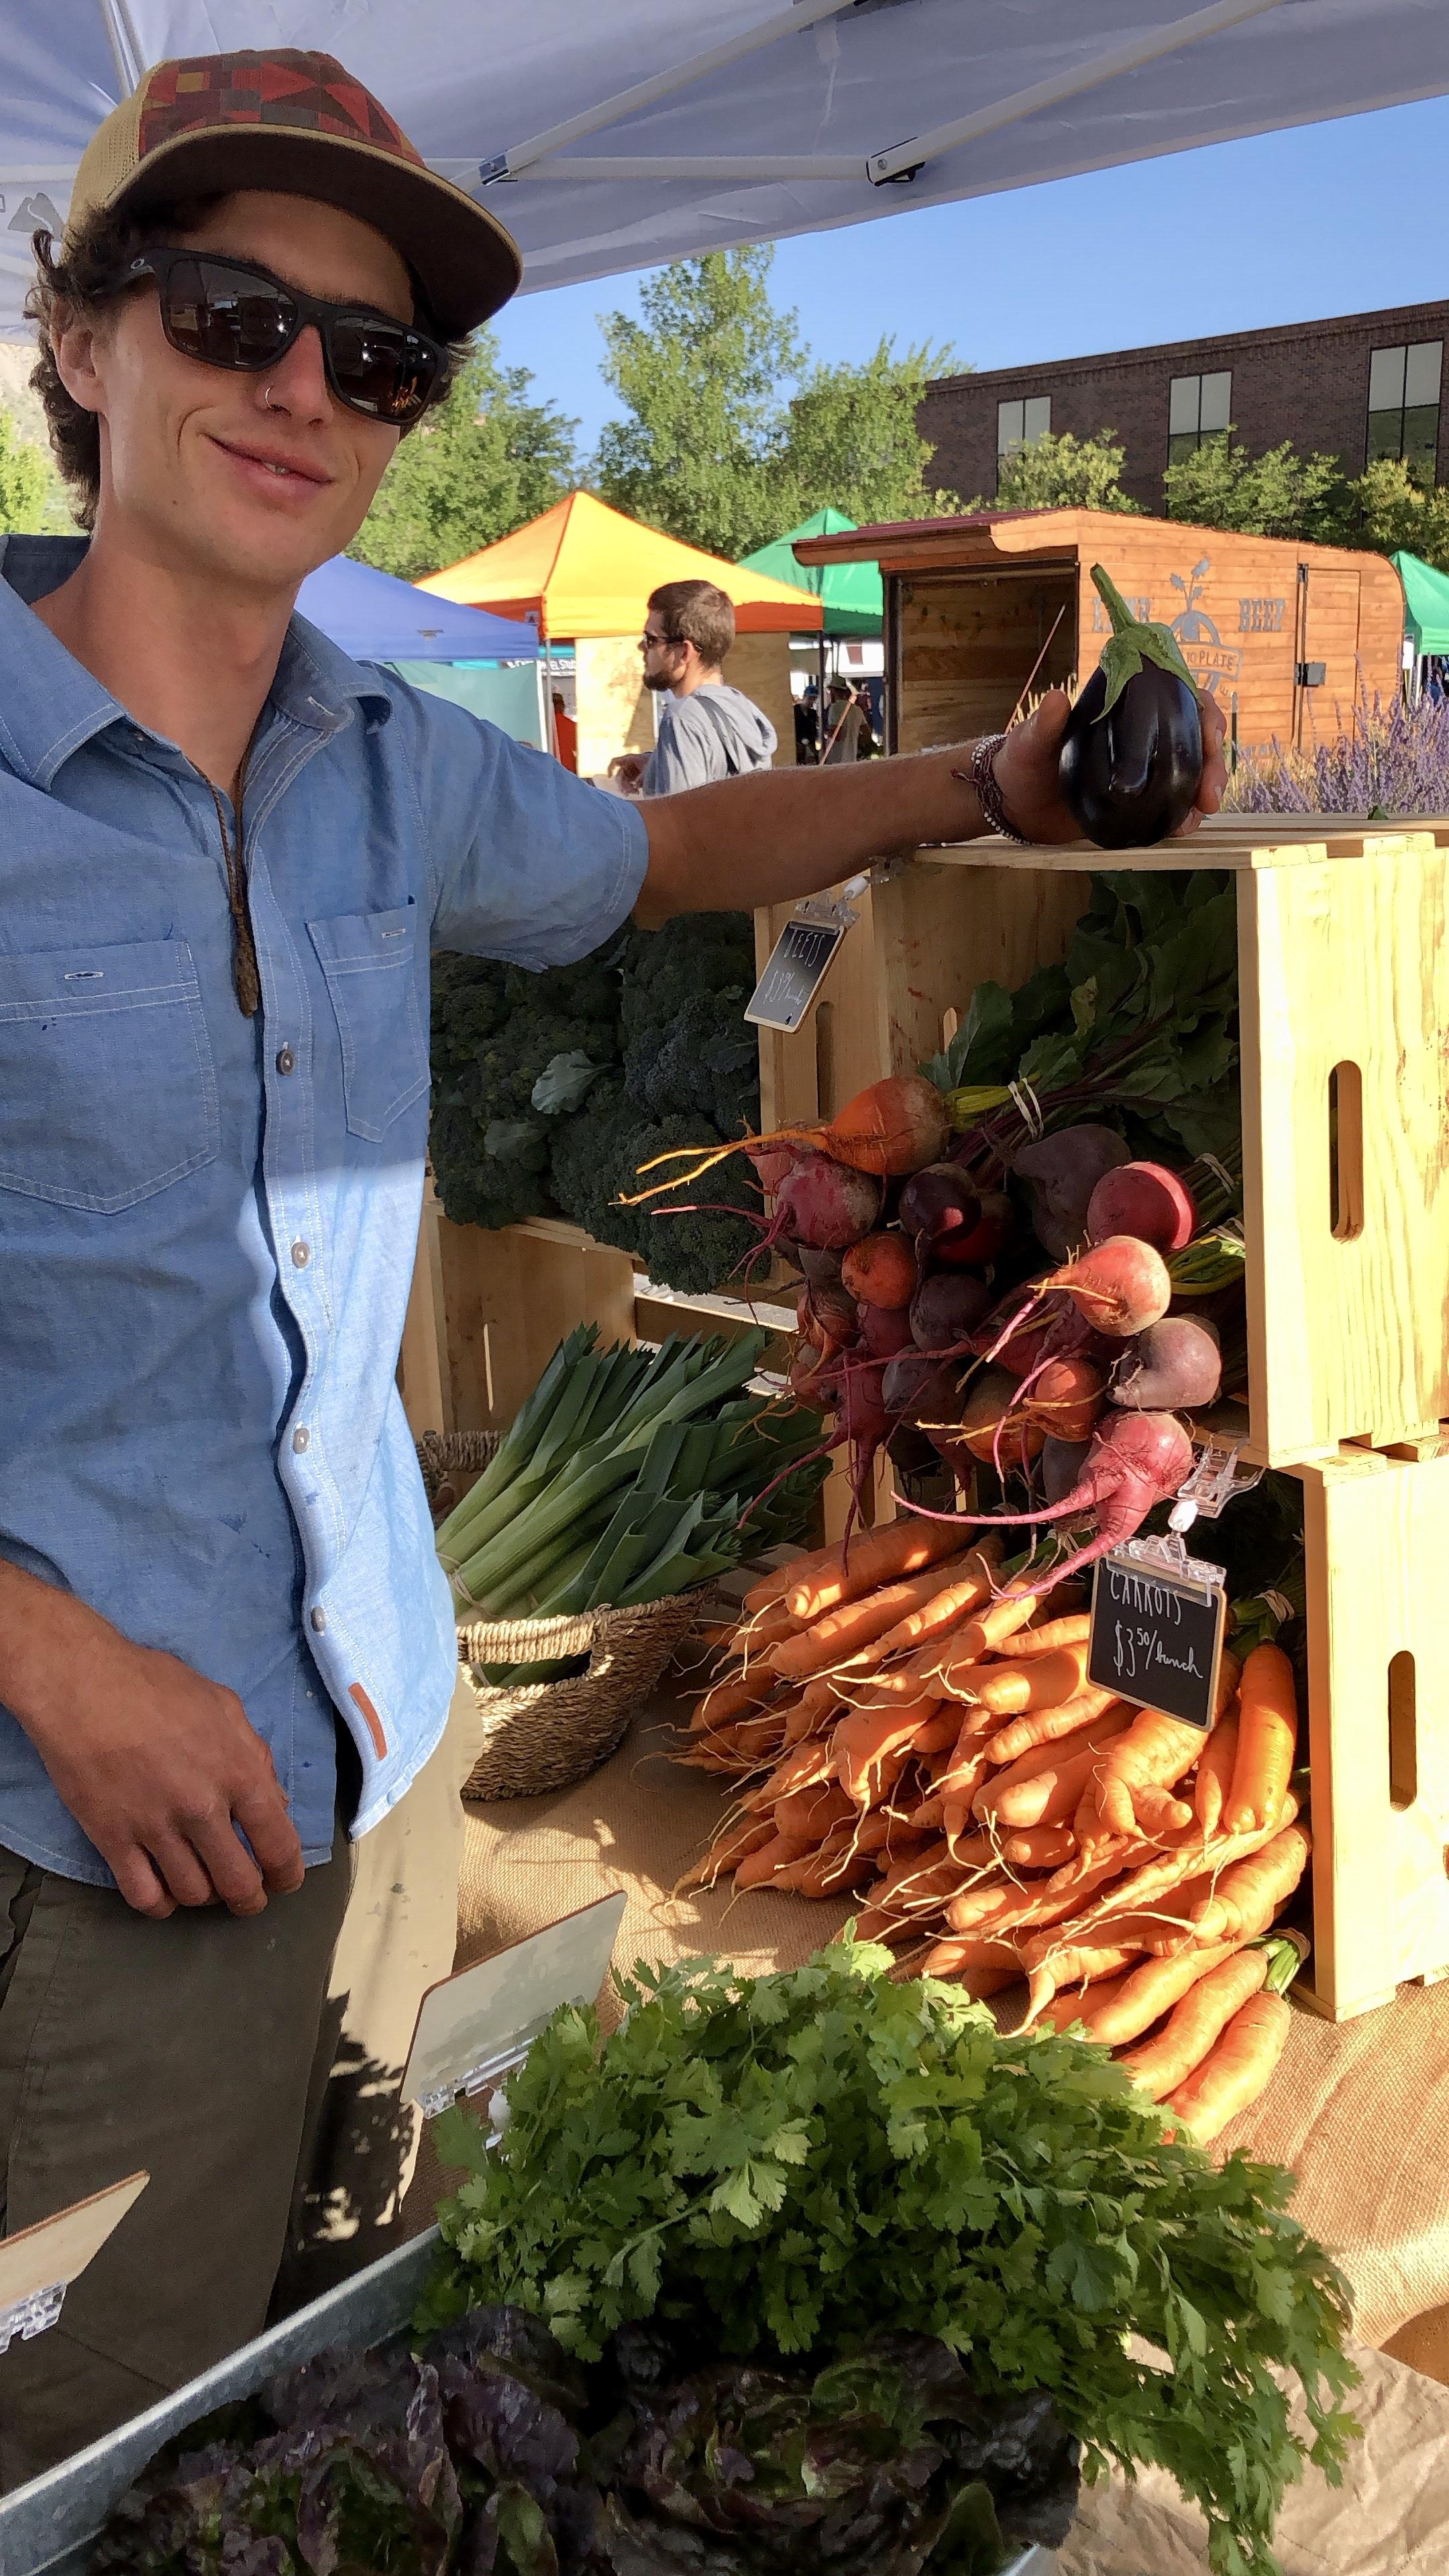 Sharing the love at the Durango Farmers Market